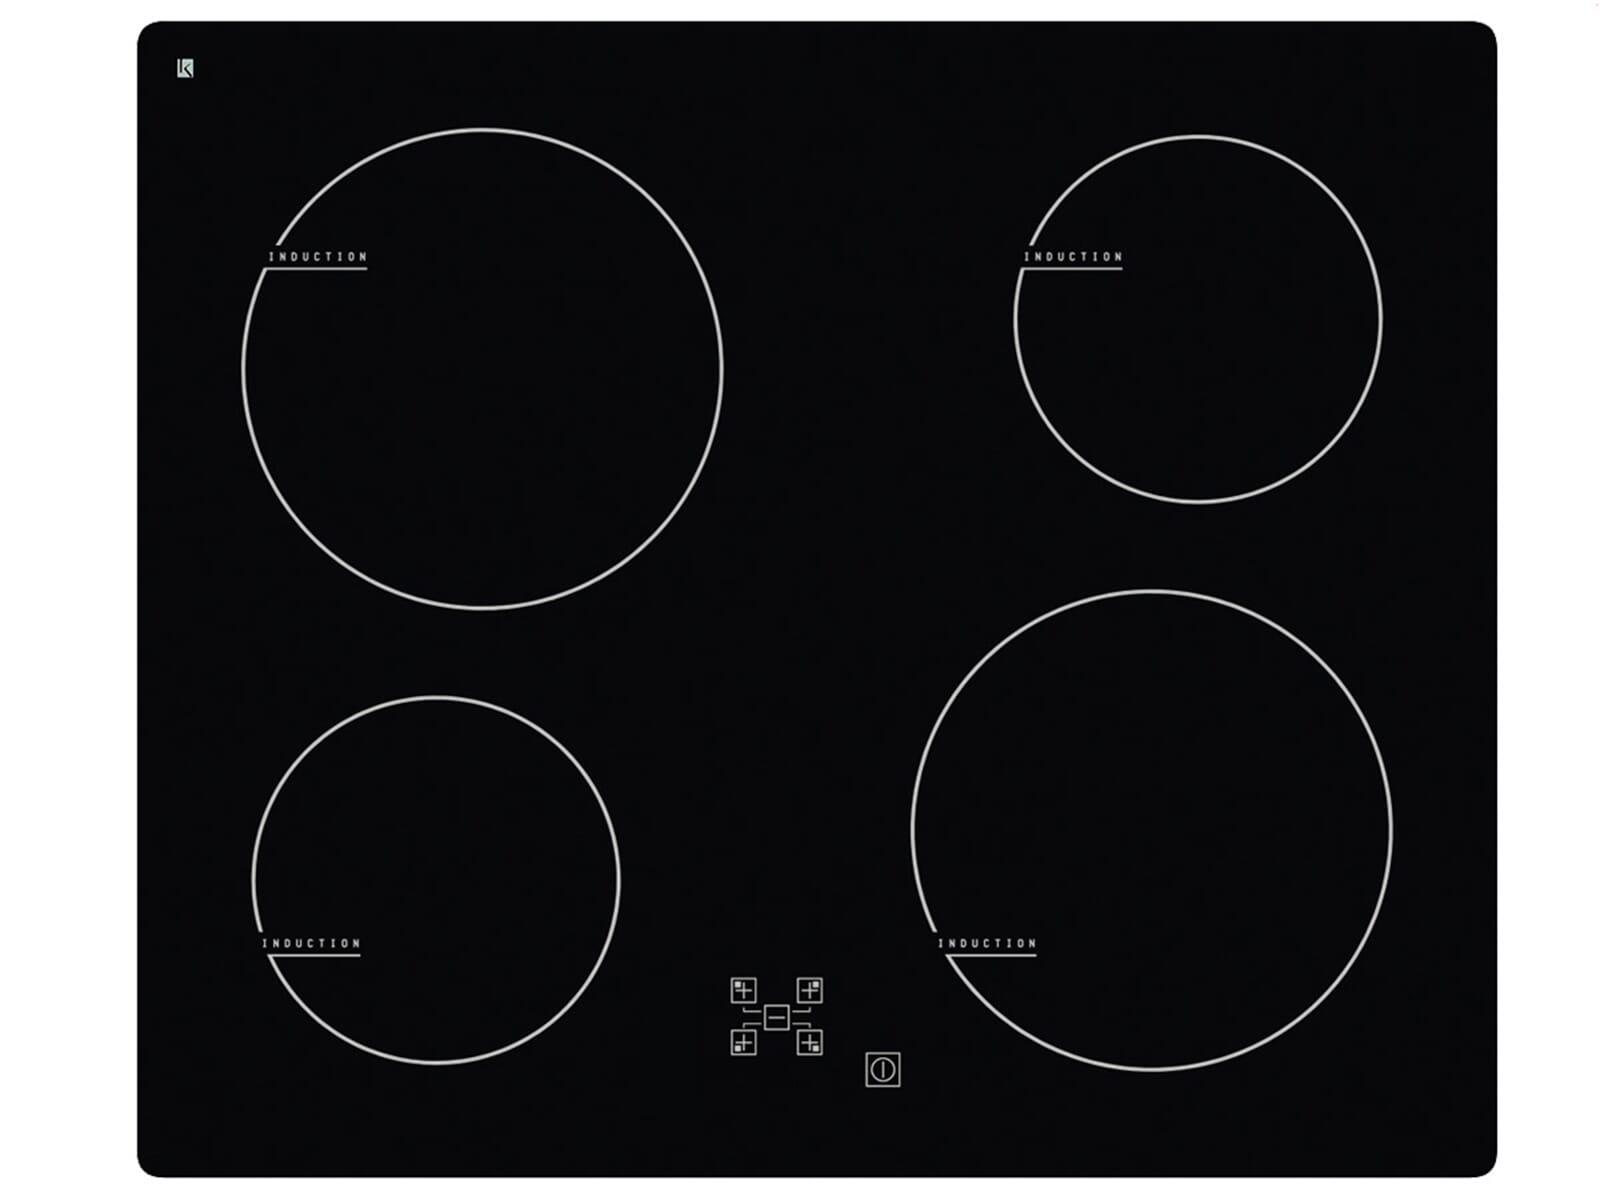 induktions kochfeld 60 cm einbau fl chenb ndig autark ebay. Black Bedroom Furniture Sets. Home Design Ideas